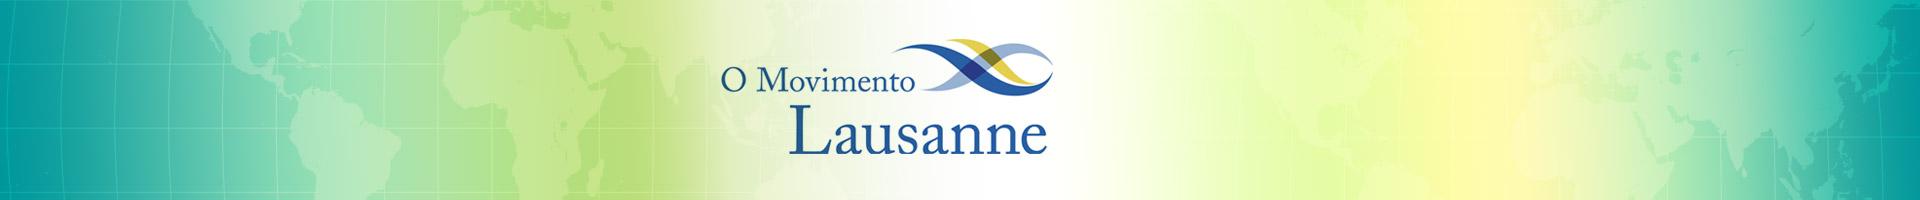 Lausanne-Banner